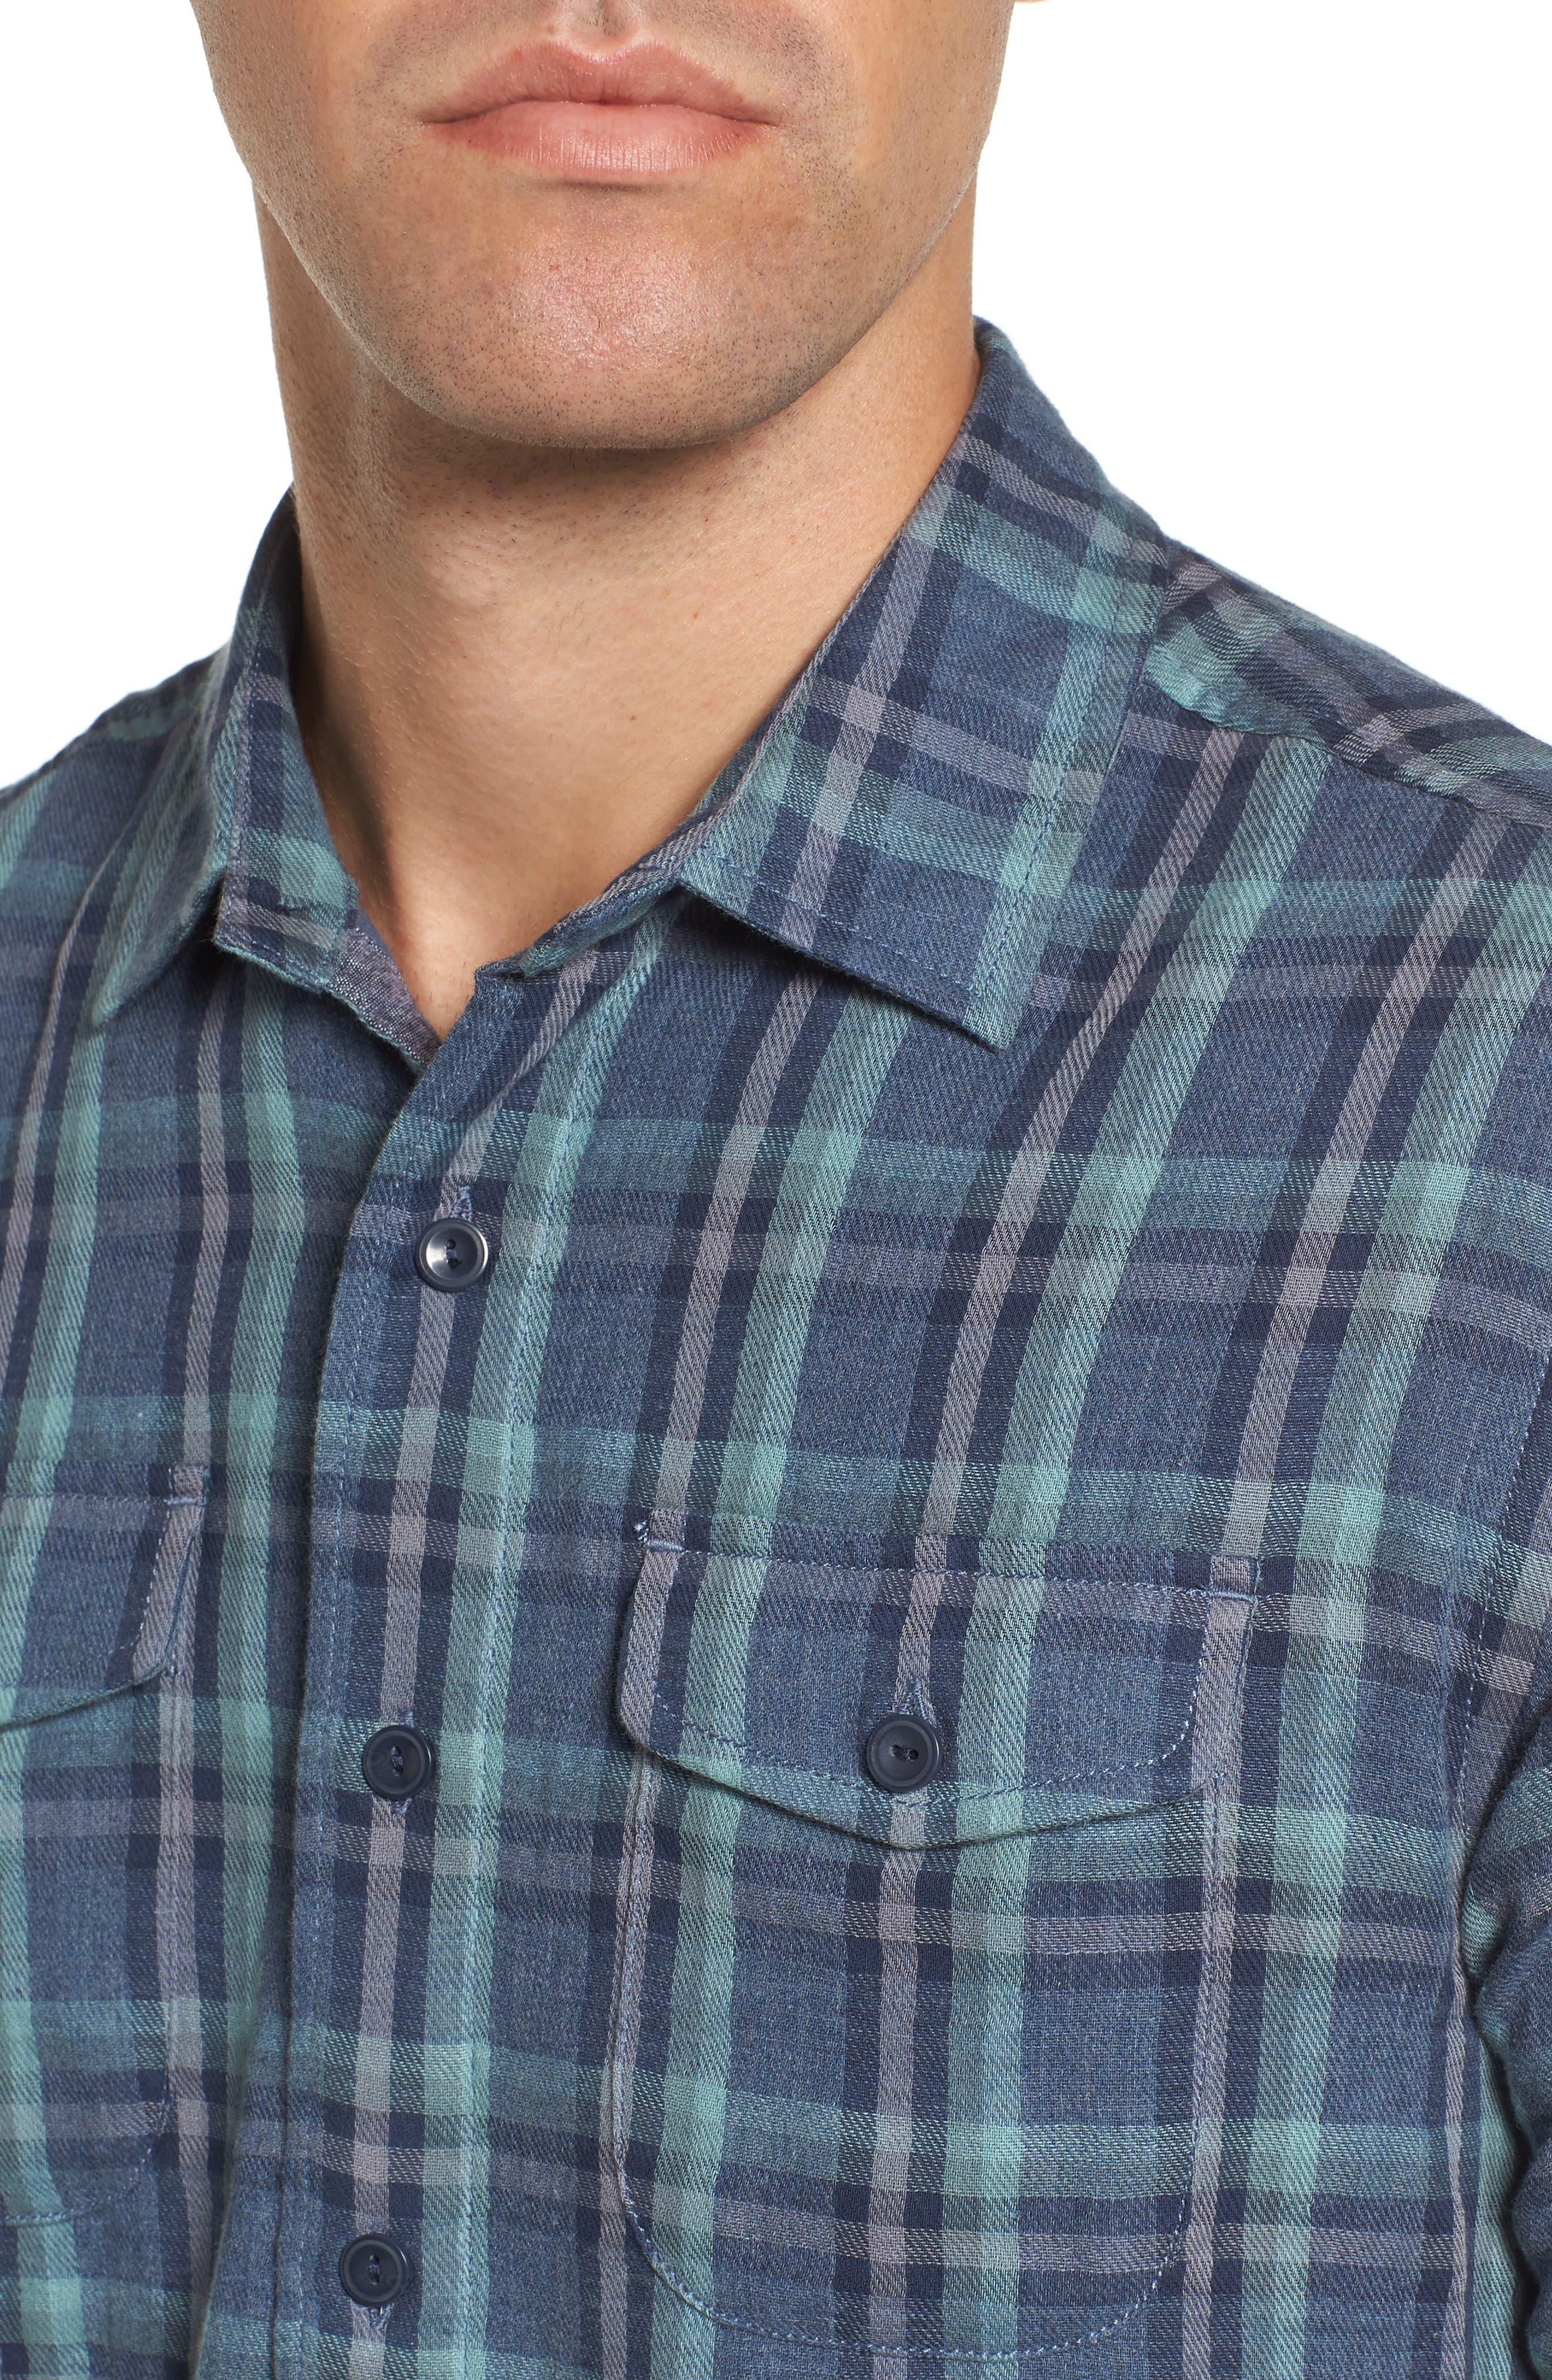 Smith Double Cloth Plaid Sport Shirt,                             Alternate thumbnail 4, color,                             Blue Navy Seafoam